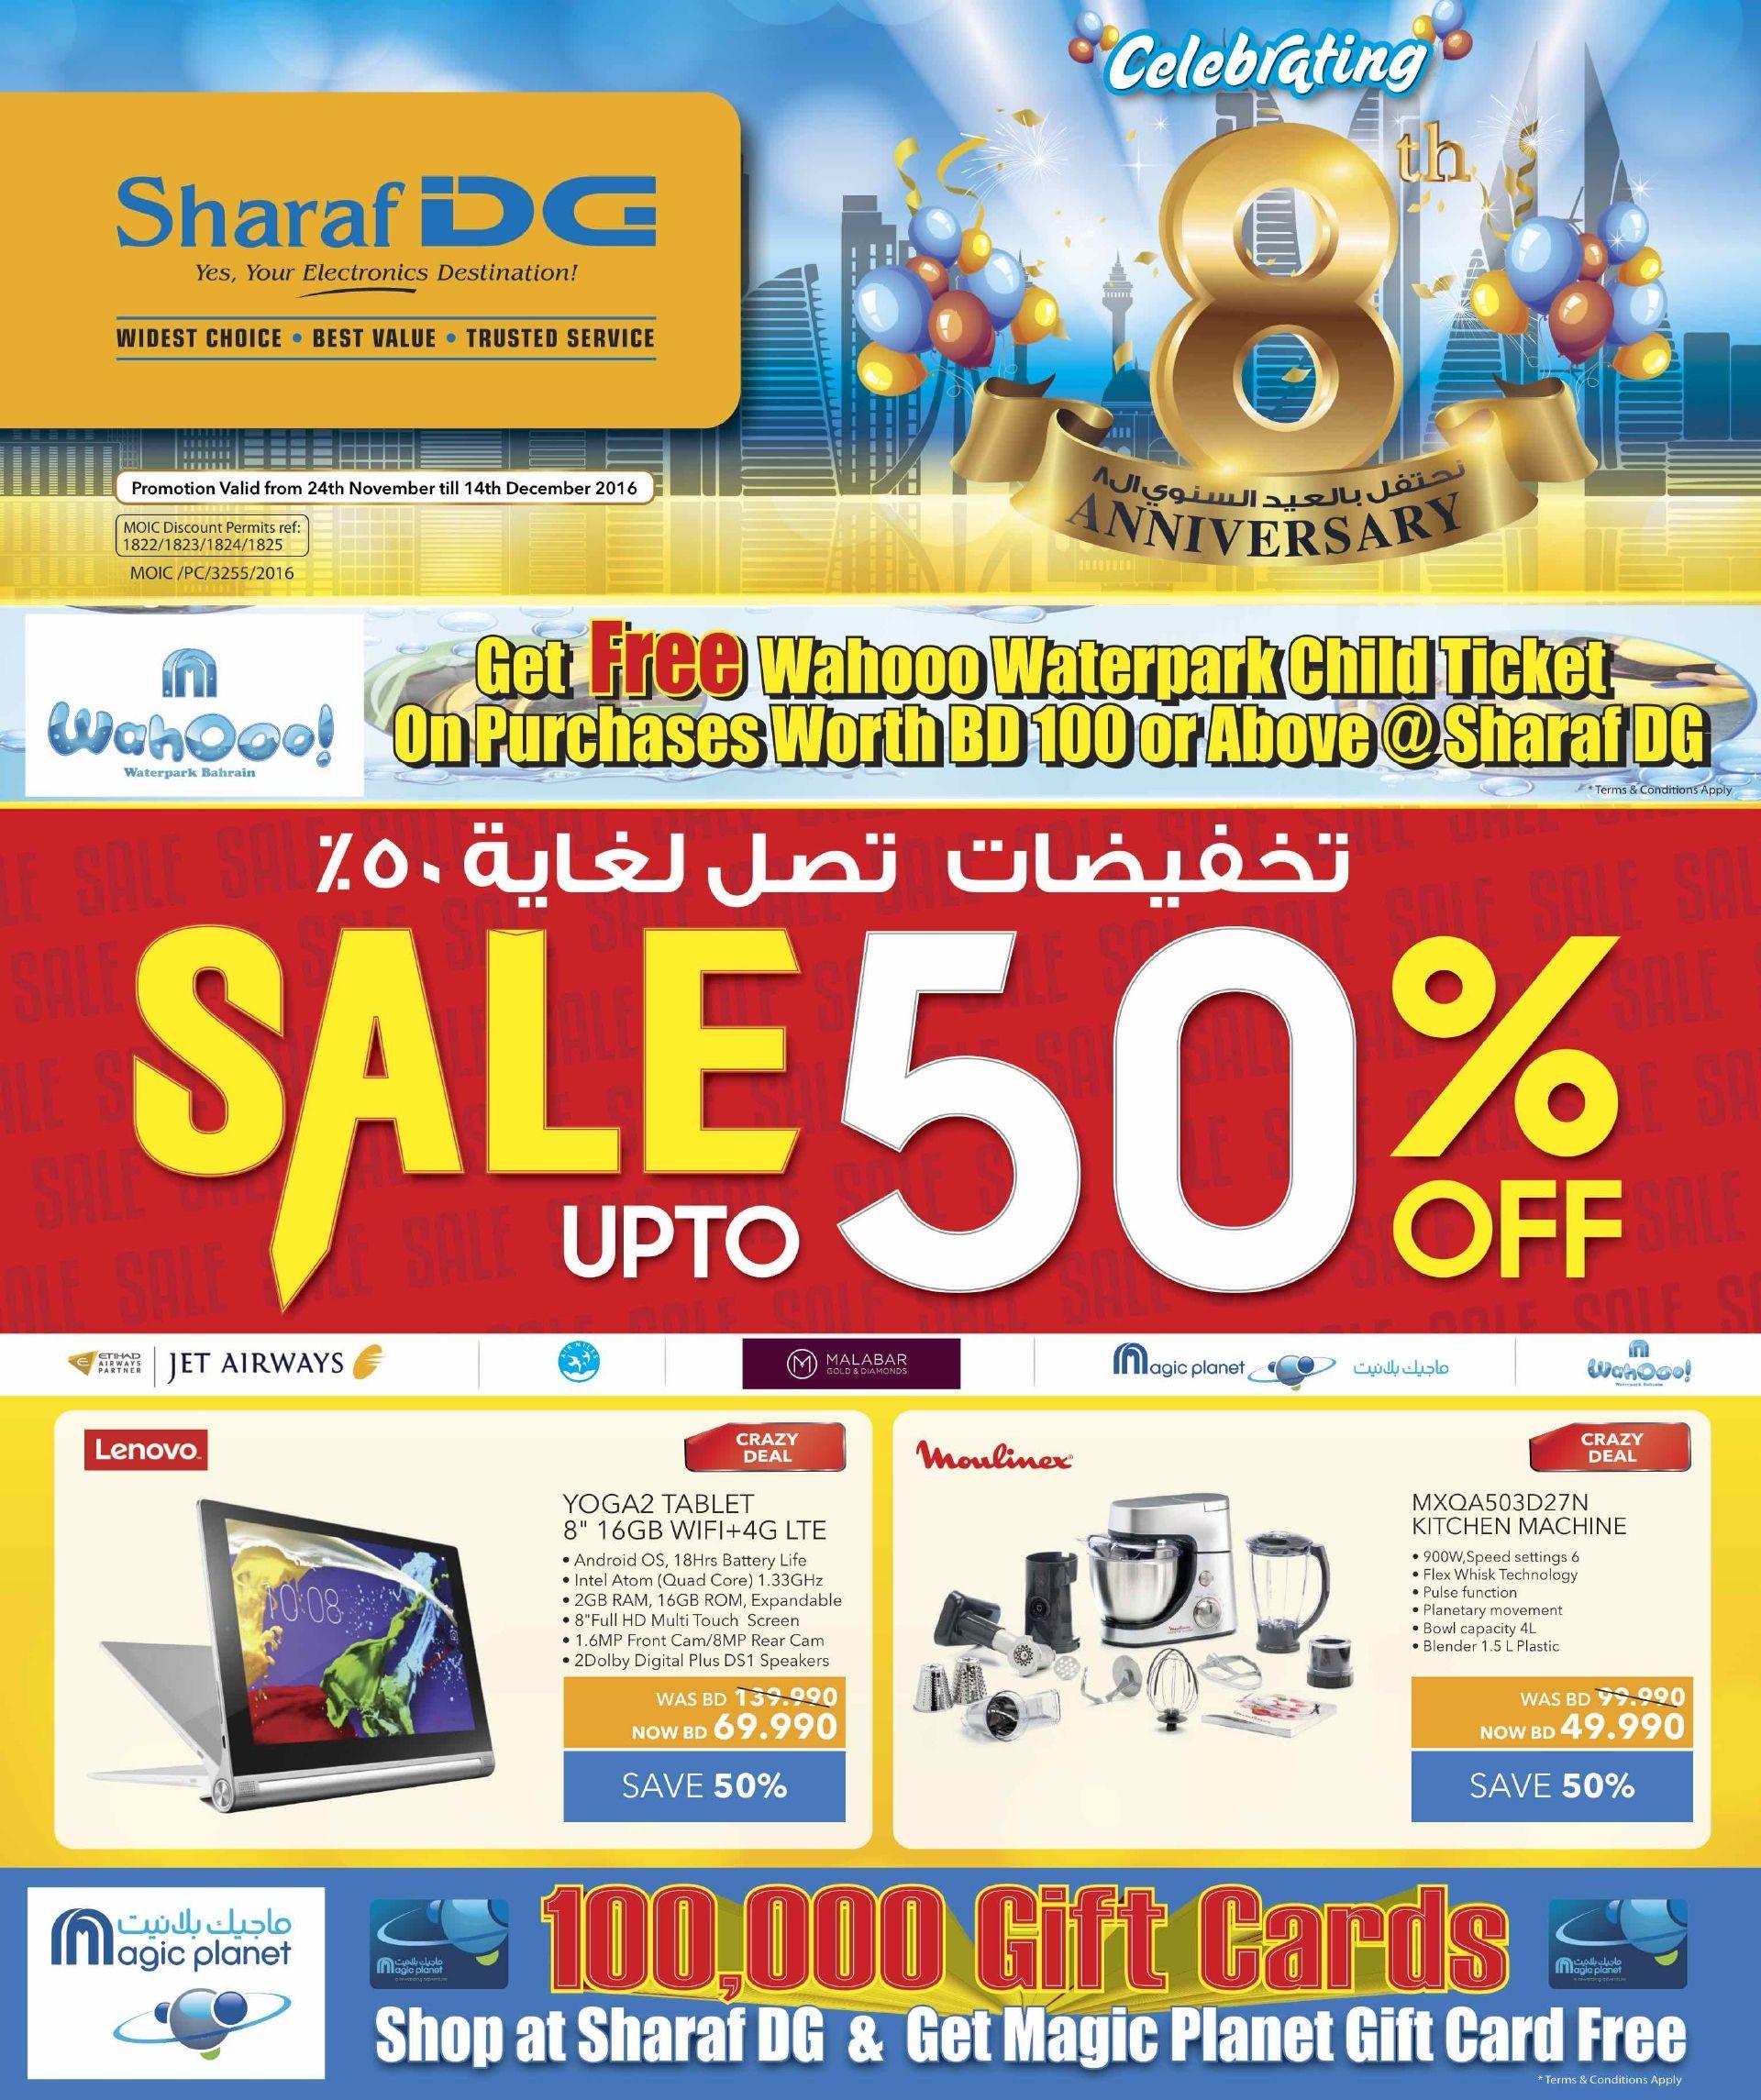 Sharaf DG Anniversary 50% Sale Offer Bahrain (24th Nov 2016